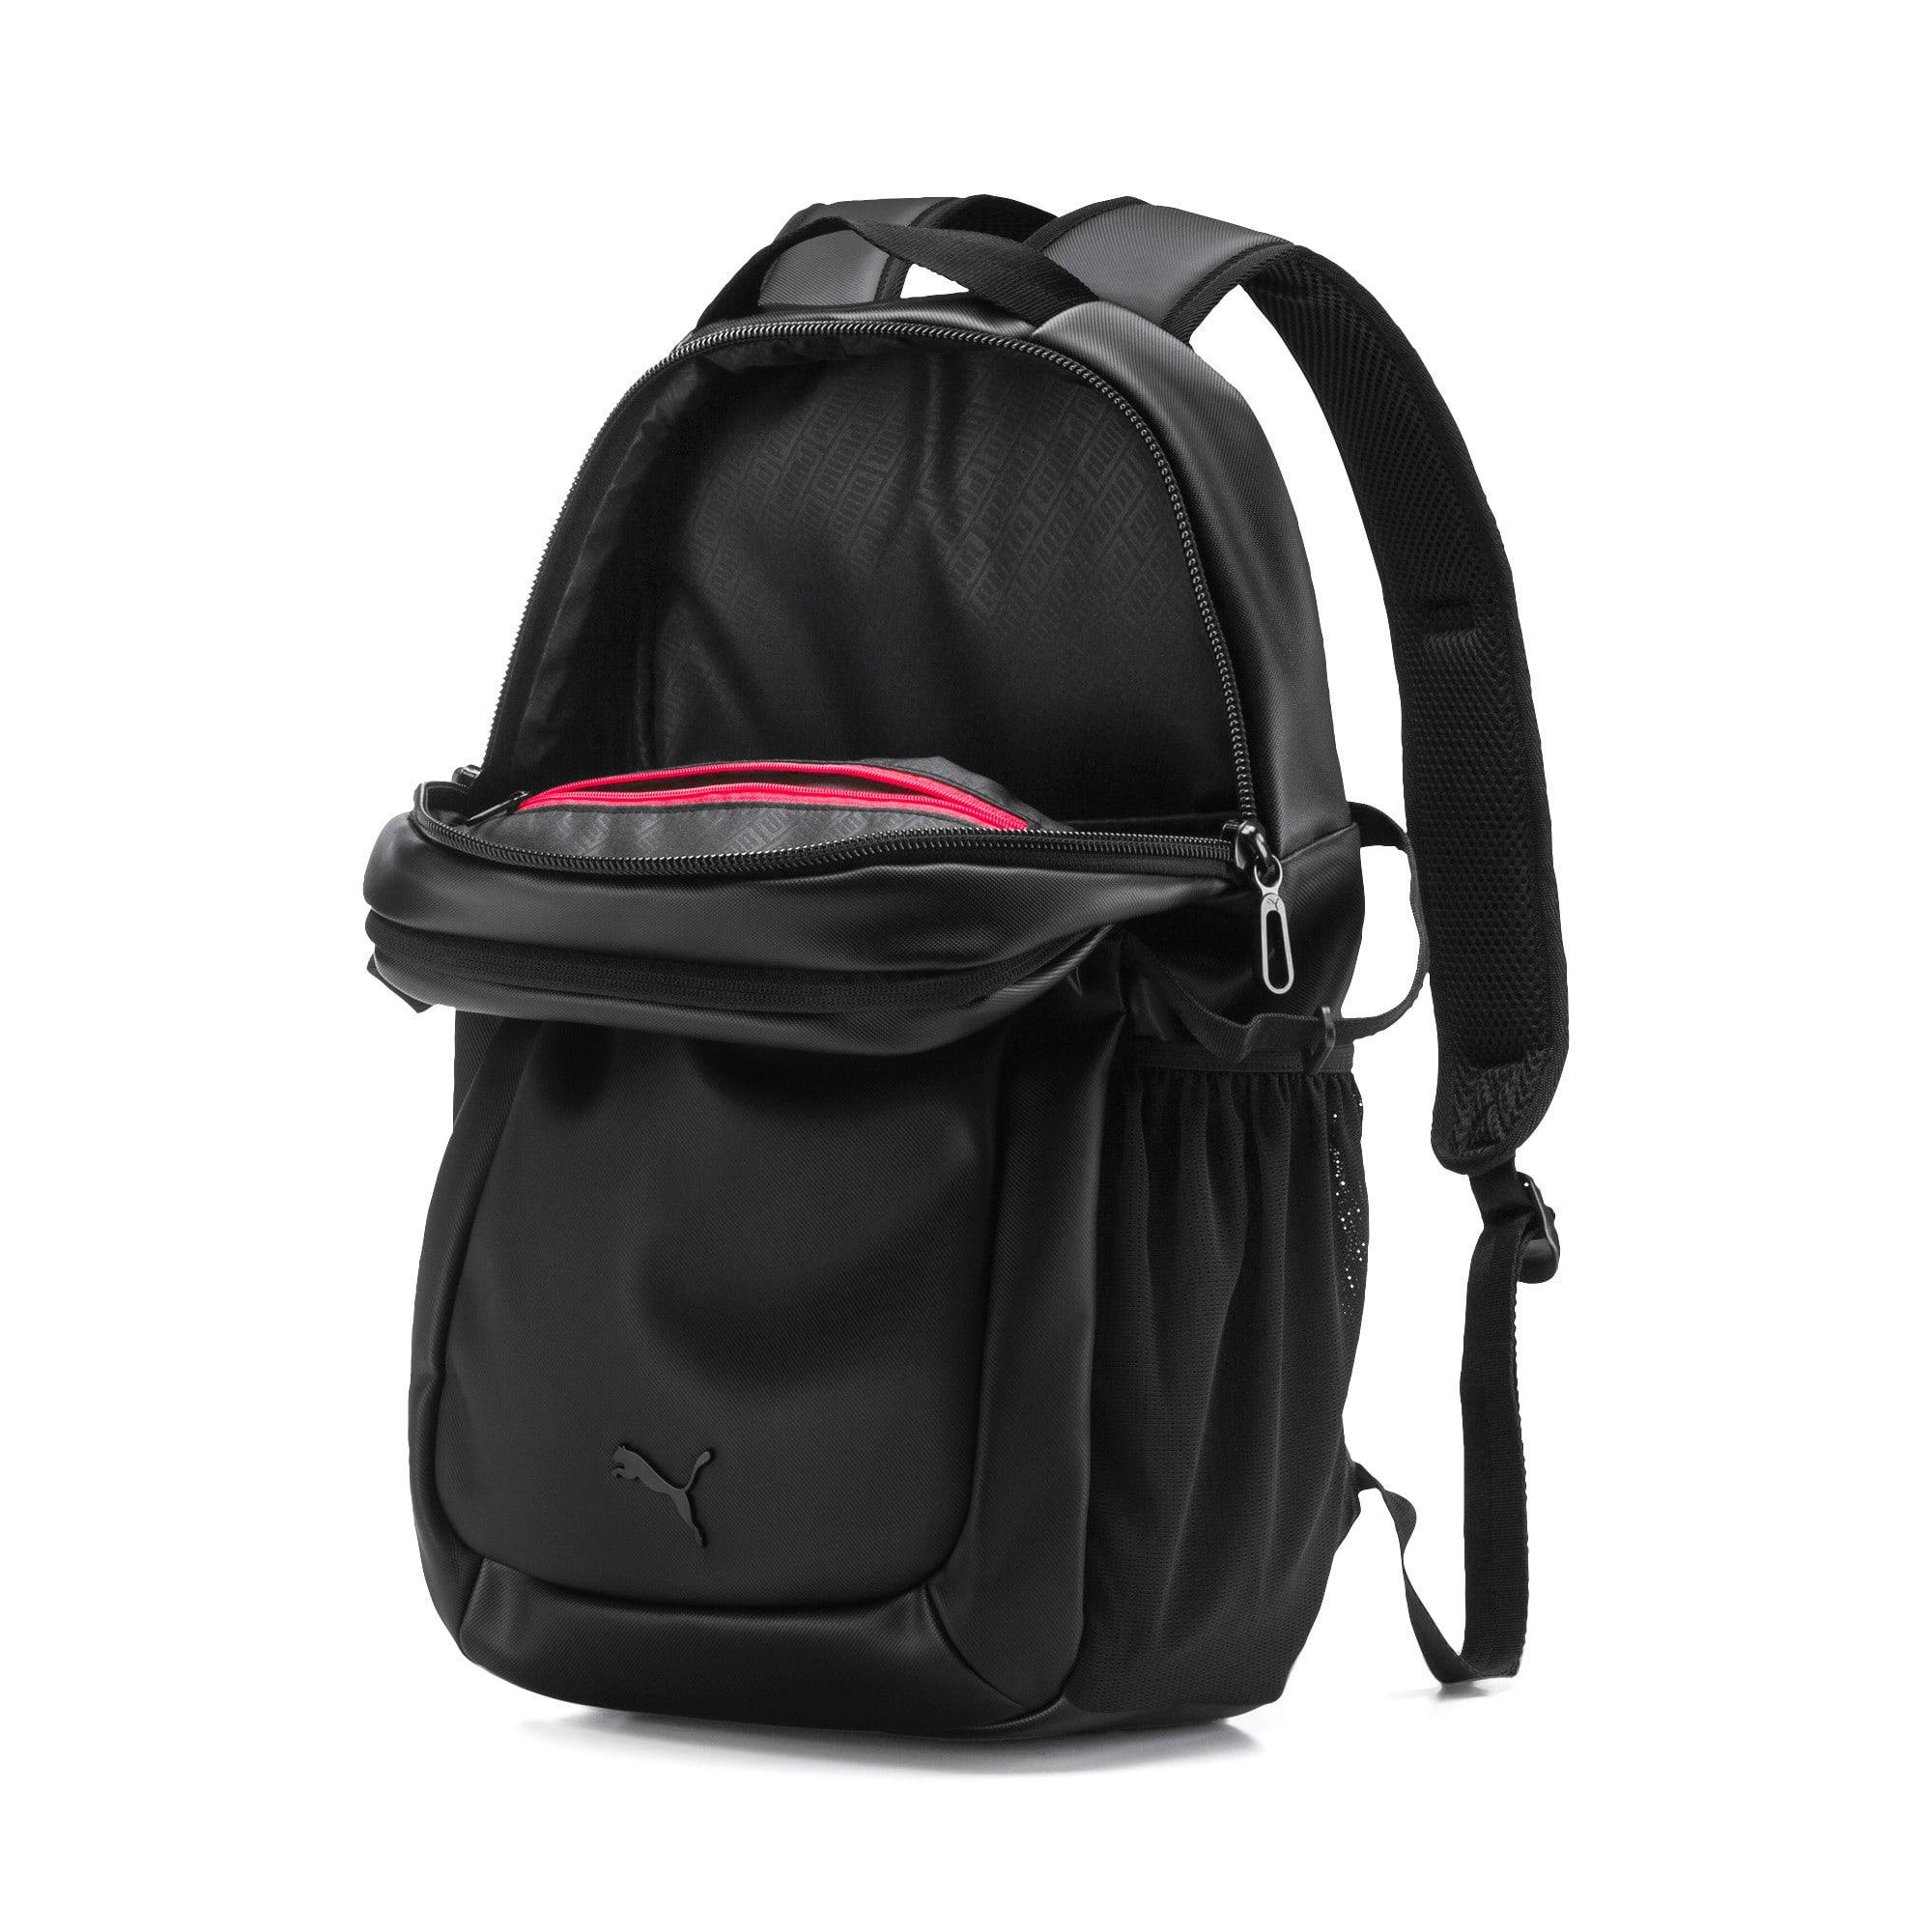 Thumbnail 3 of Scuderia Ferrari Lifestyle Backpack, Puma Black, medium